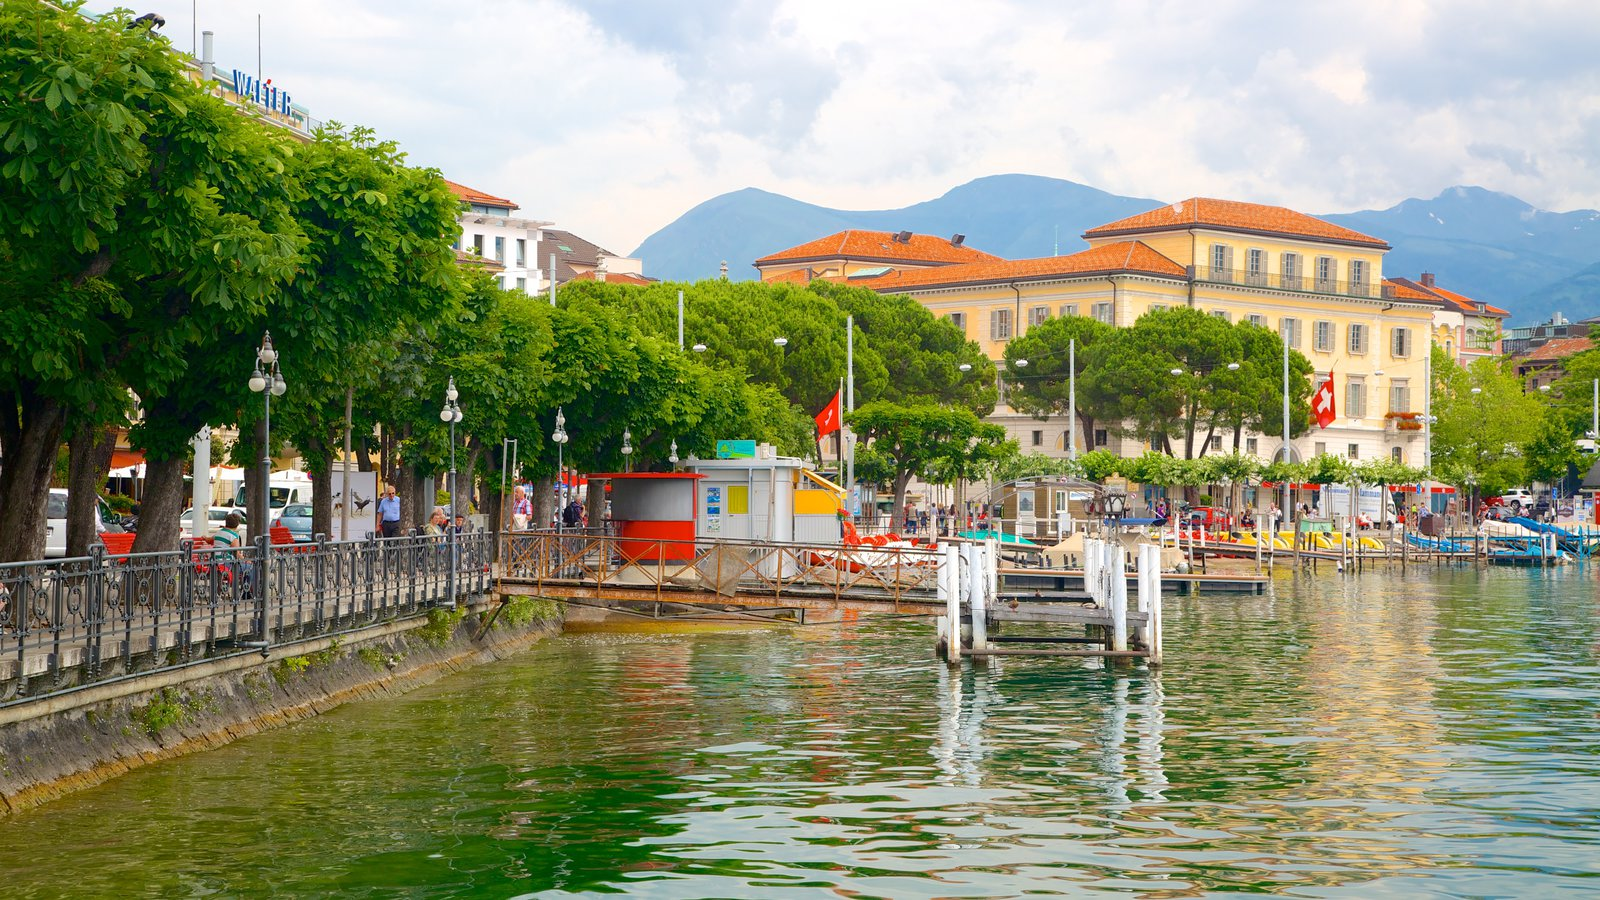 Image result for Lugano lake switzerland wallpaper